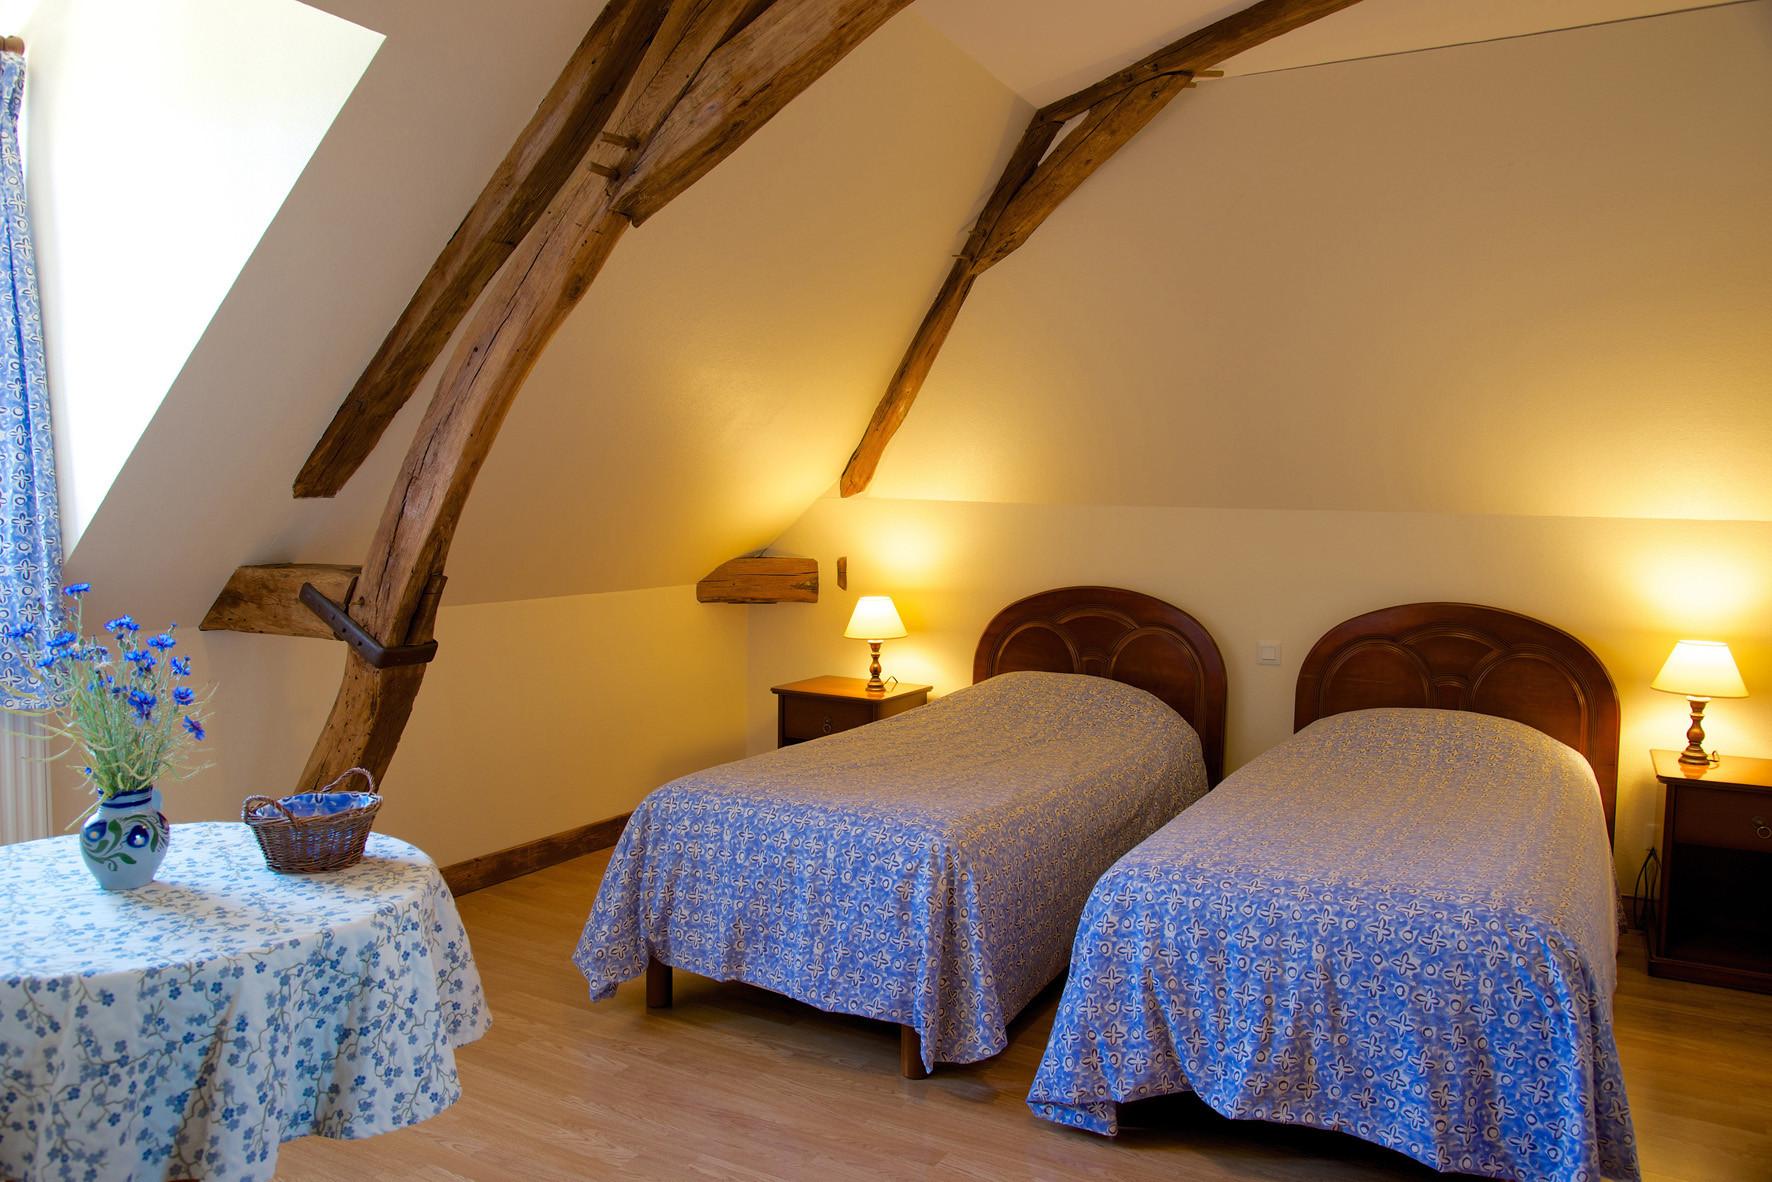 2 lits dans la chambre Bleuet